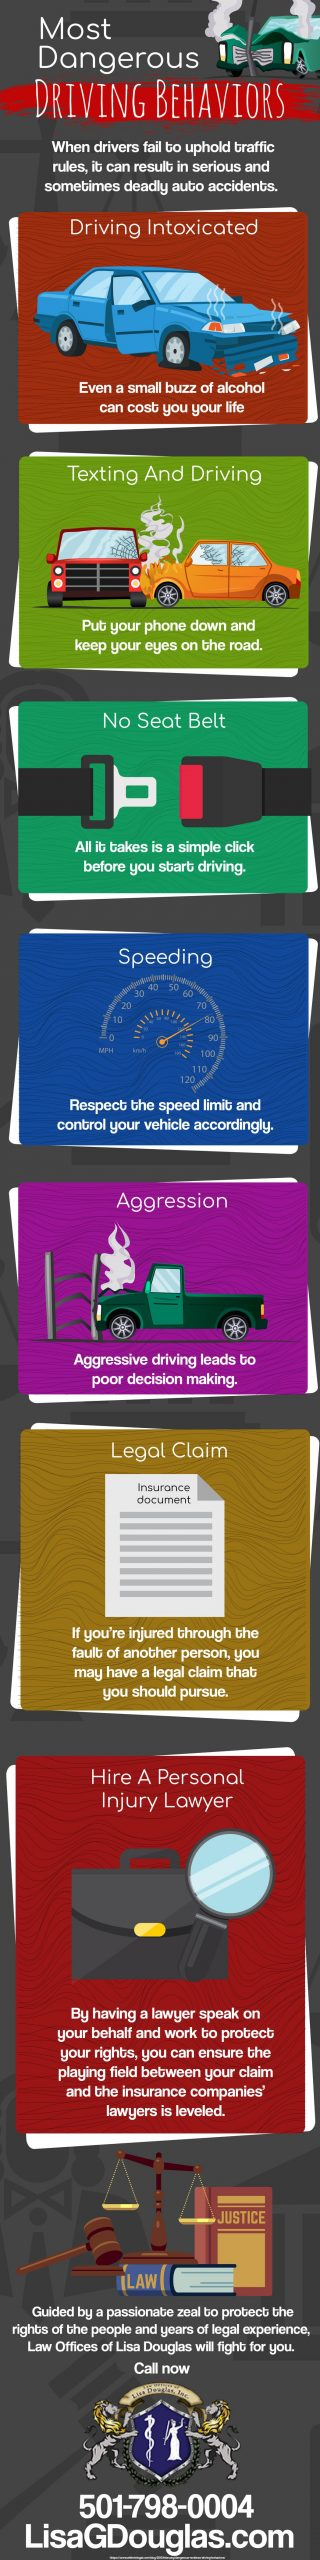 Most Dangerous Driving Behaviors